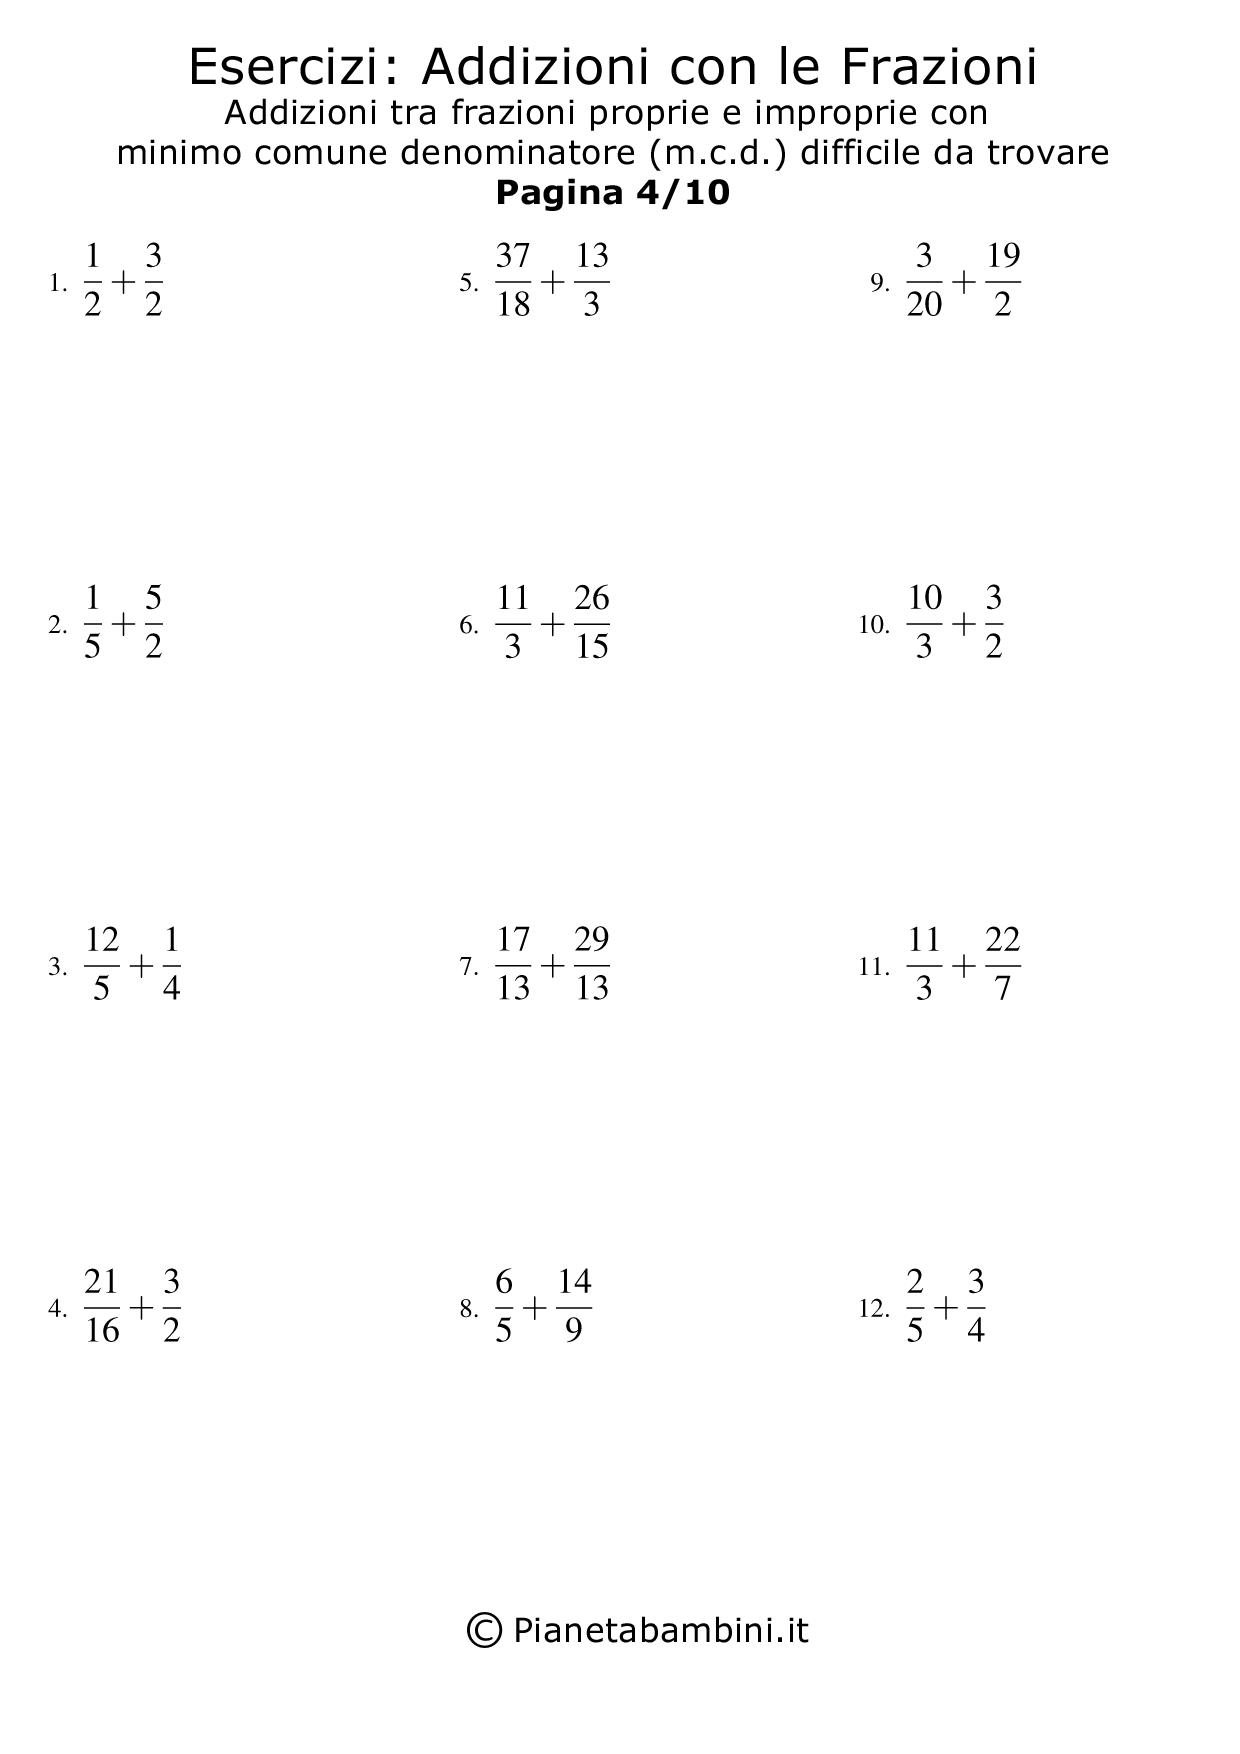 Frazioni-Proprie-Improprie-m.c.d-difficile_04